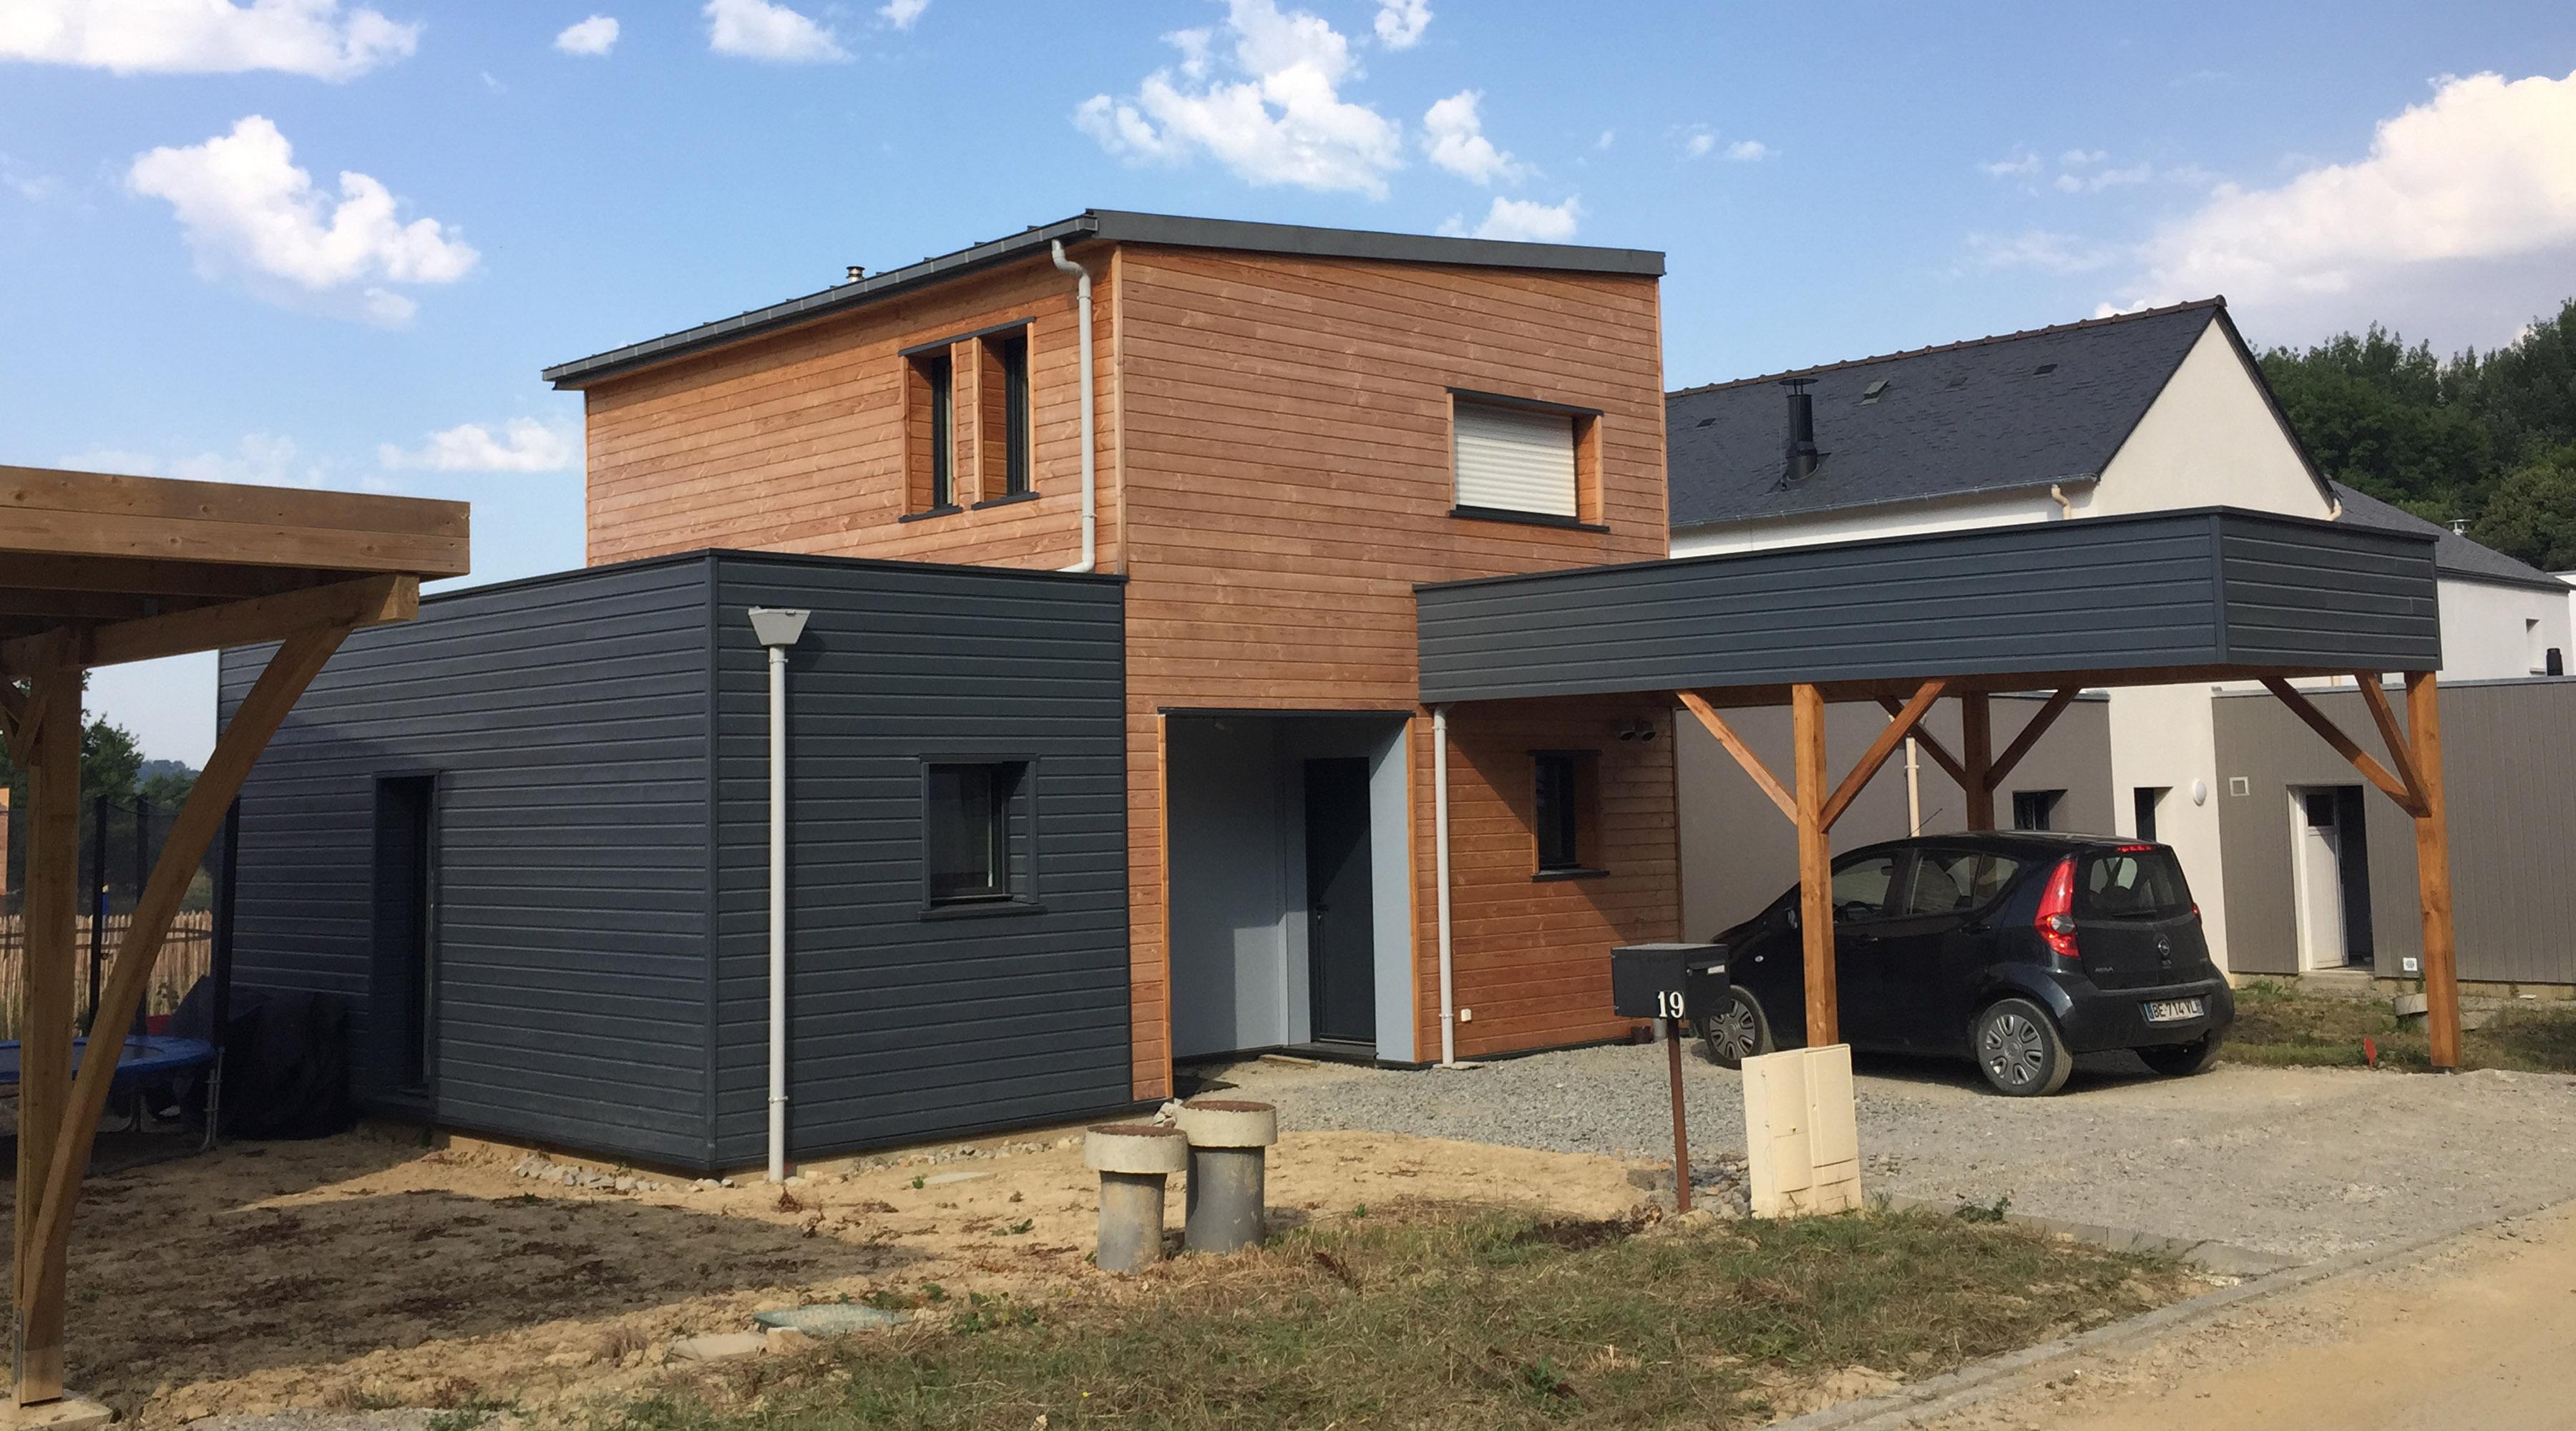 maison bois 1 2 vue architecte lise roturier. Black Bedroom Furniture Sets. Home Design Ideas